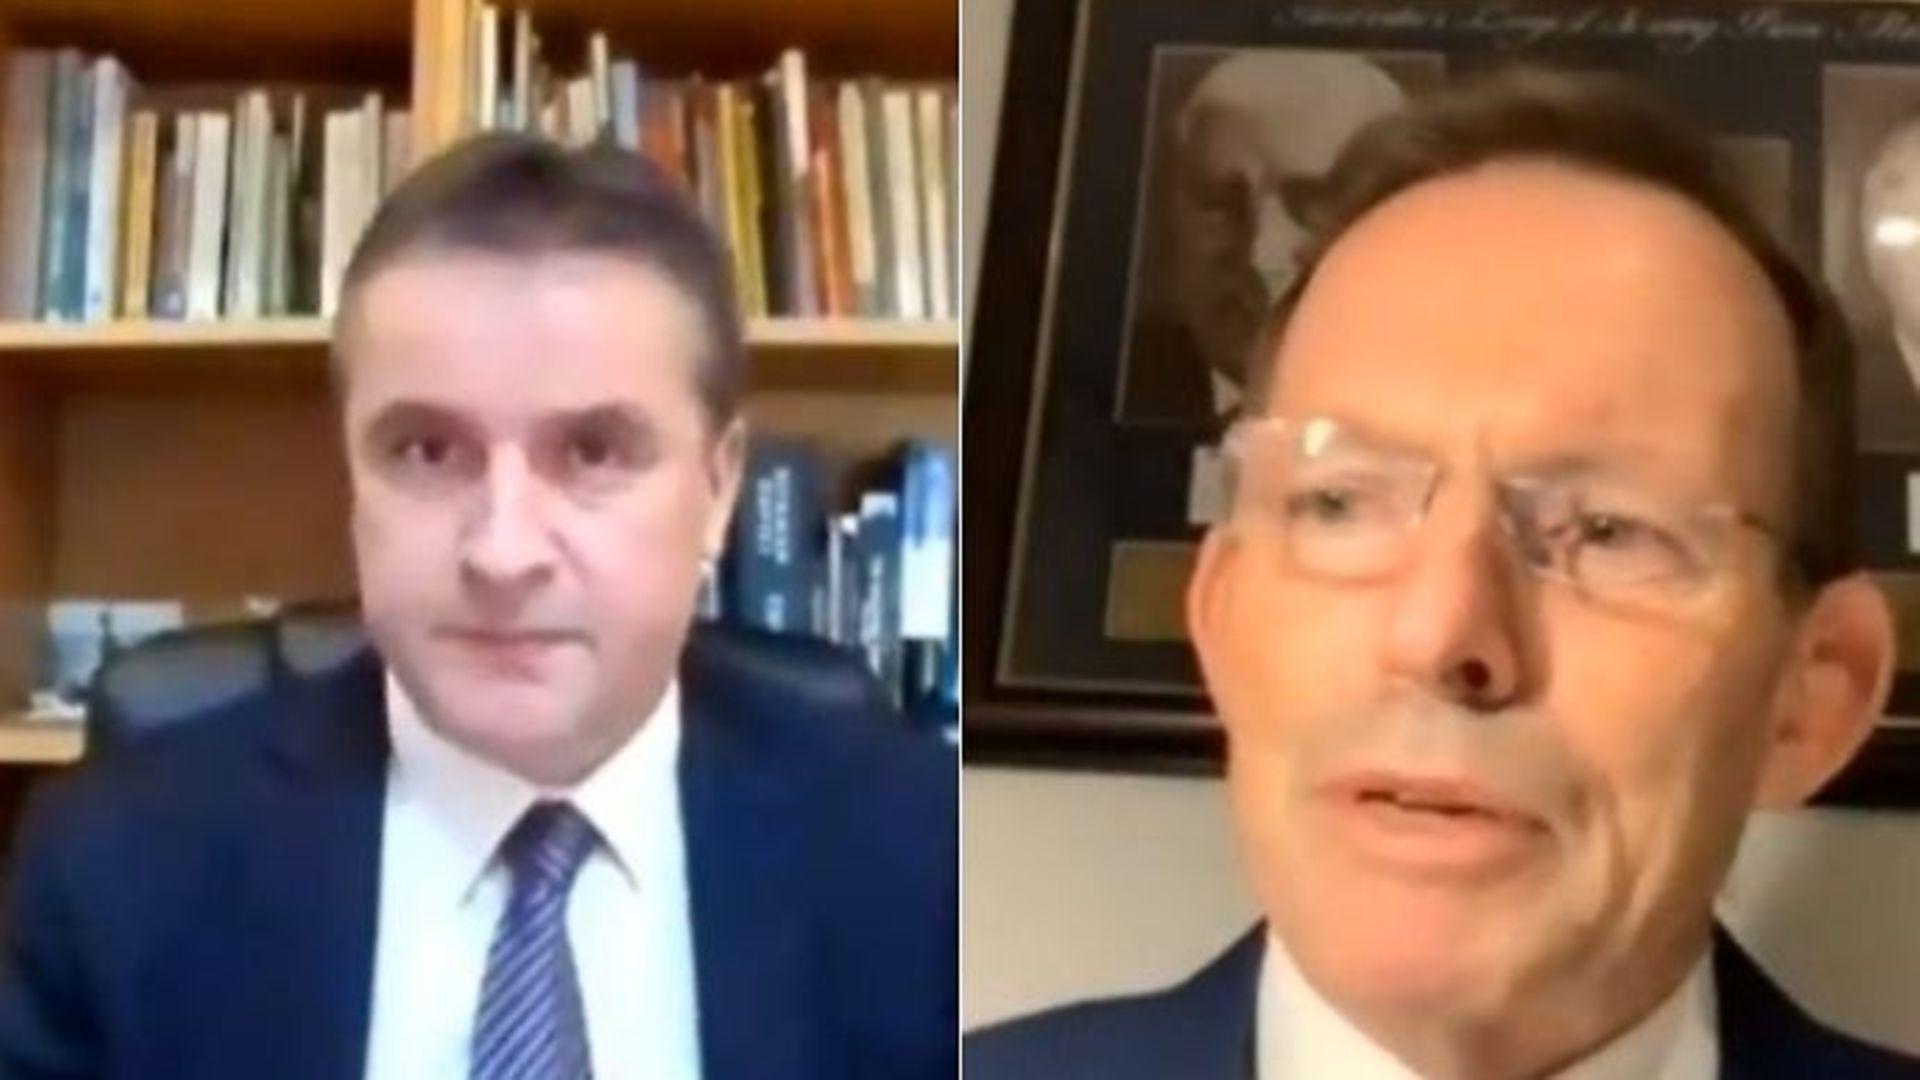 The SNP's Angus Brendan MacNeil (L) and Britain newest trade envoy Tony Abbott - Credit: Parliamentlive.tv